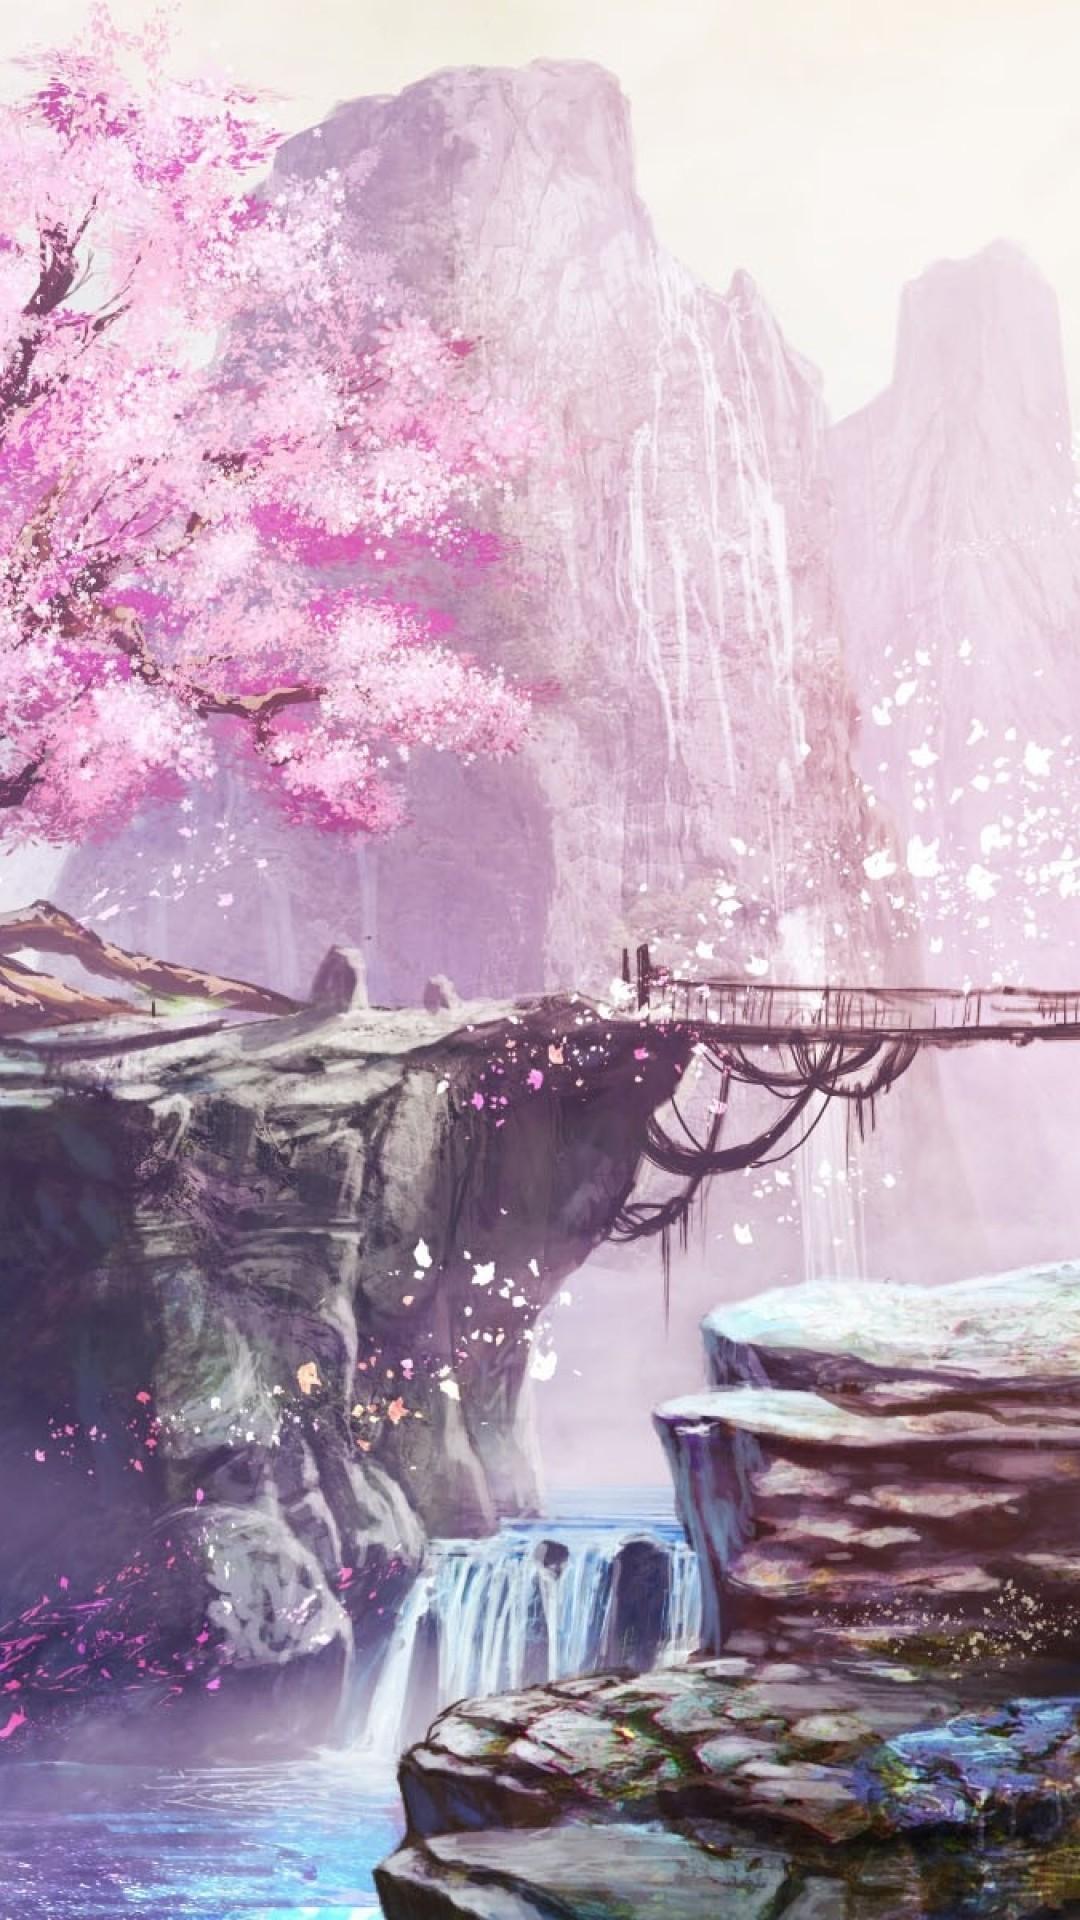 Cherry blossoms iphone wallpaper 75 images - Portrait anime wallpaper ...